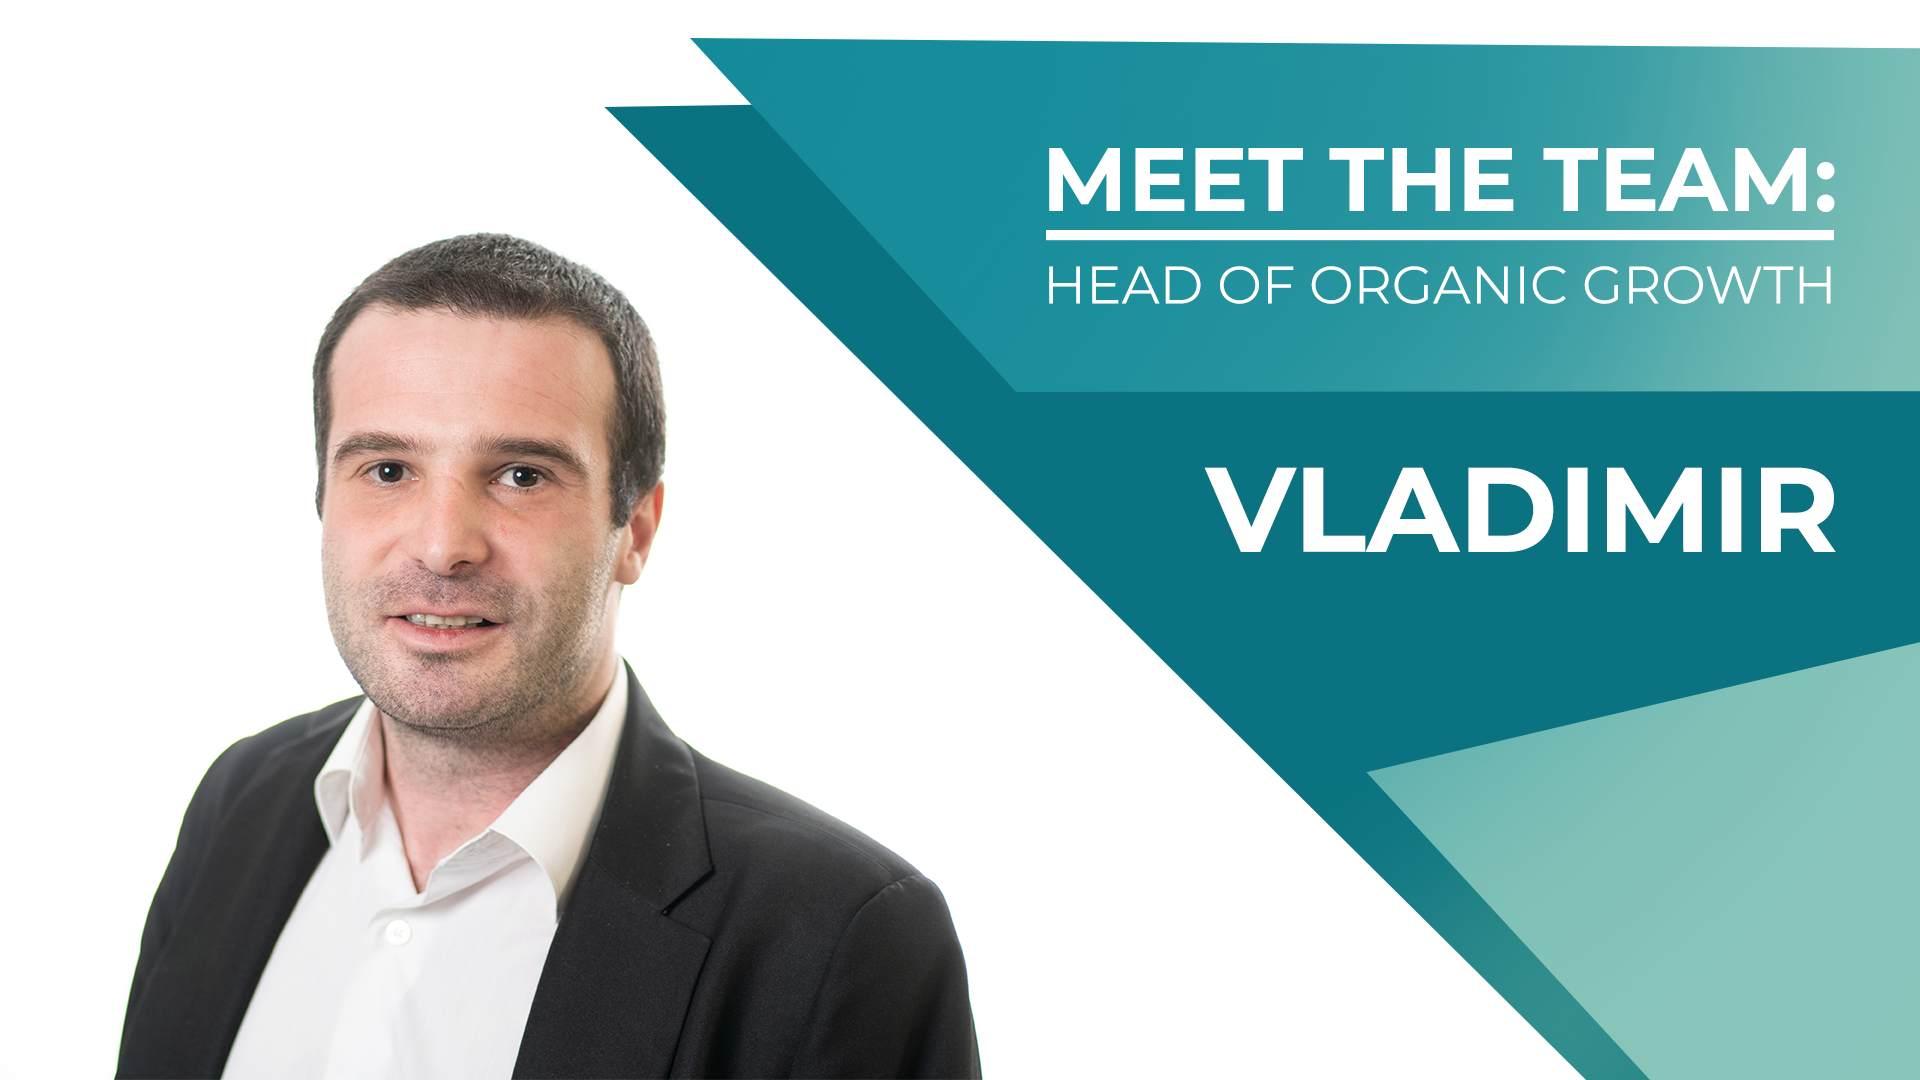 Vladimir Ninov, Head of Organic Growth at 365 Data Science